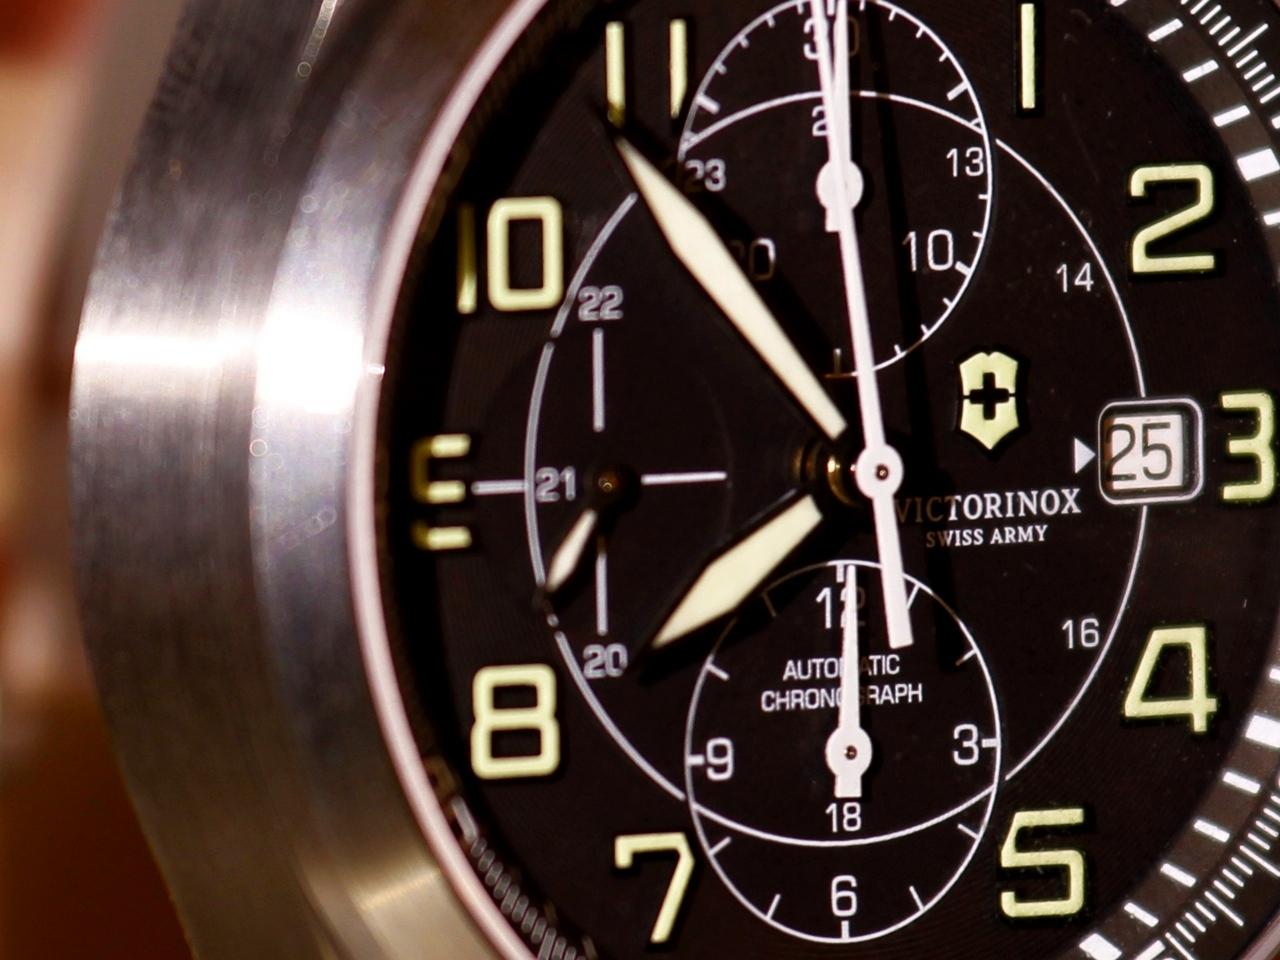 watch-test-victorinox-swiss-army-chronograph-automatic-prezzo-price-0-100_38